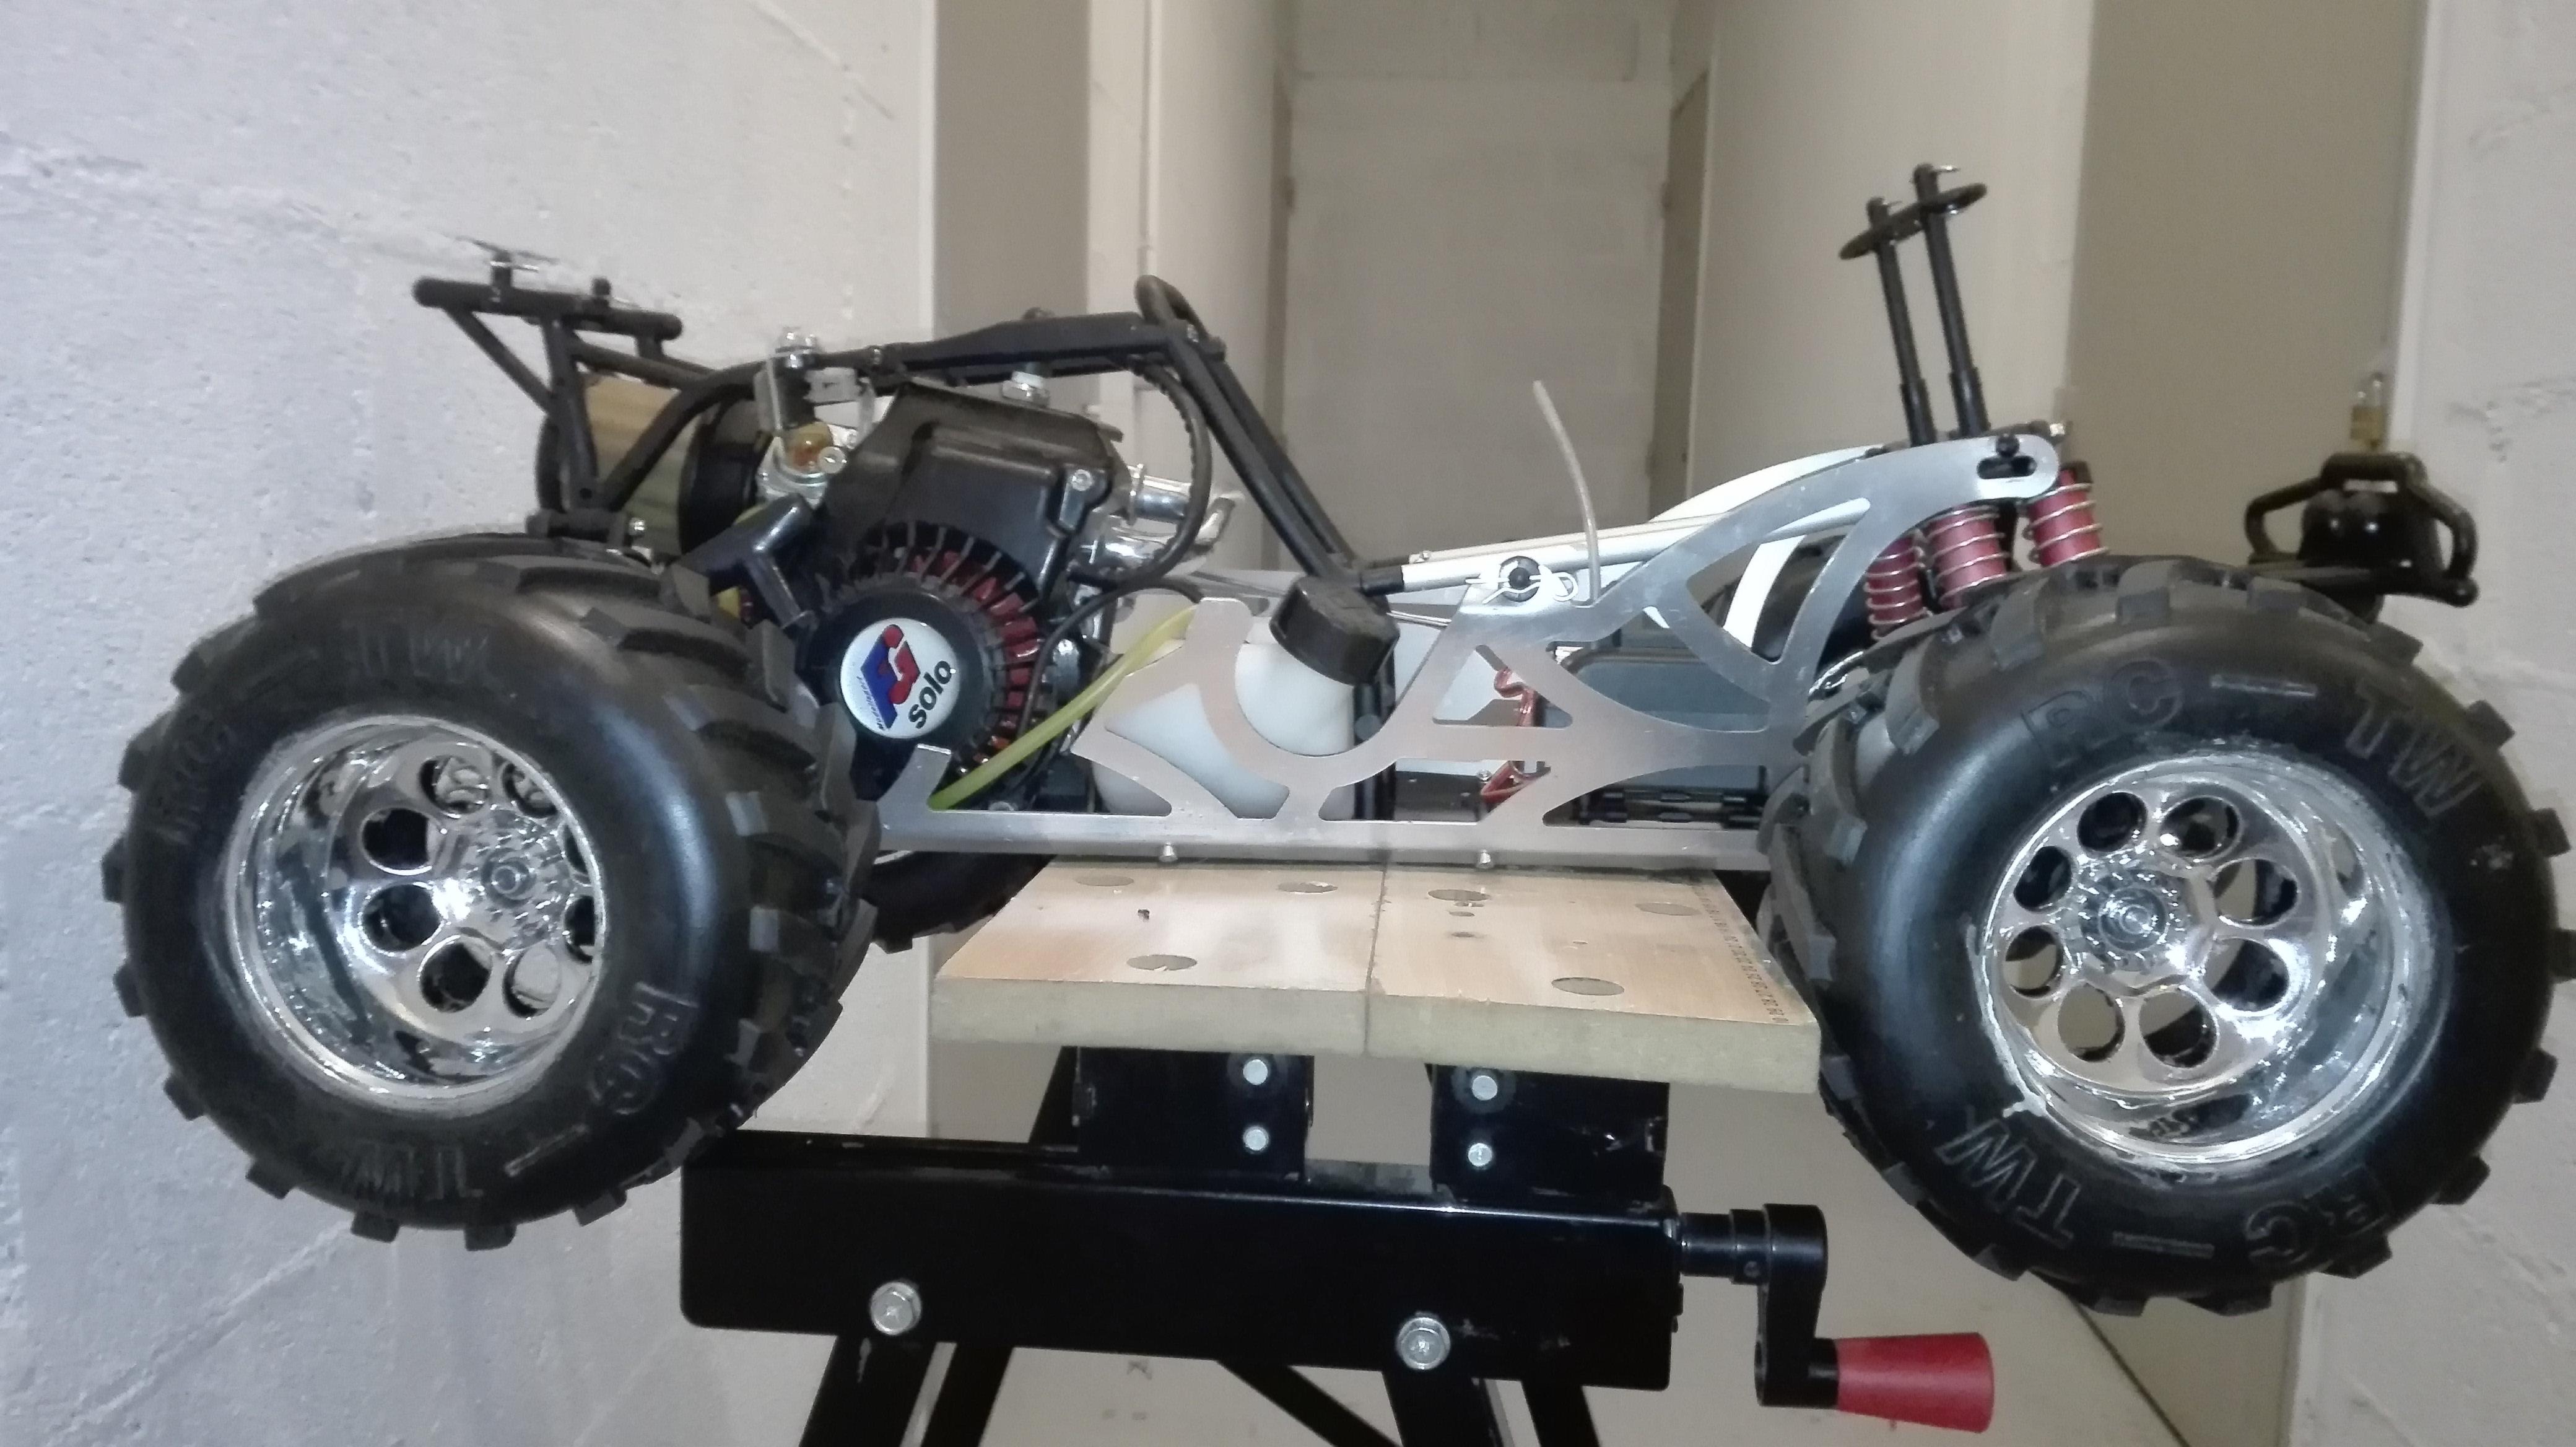 re-montage complet monster truck FG depuis un chassis nu - Page 2 180410111814468608